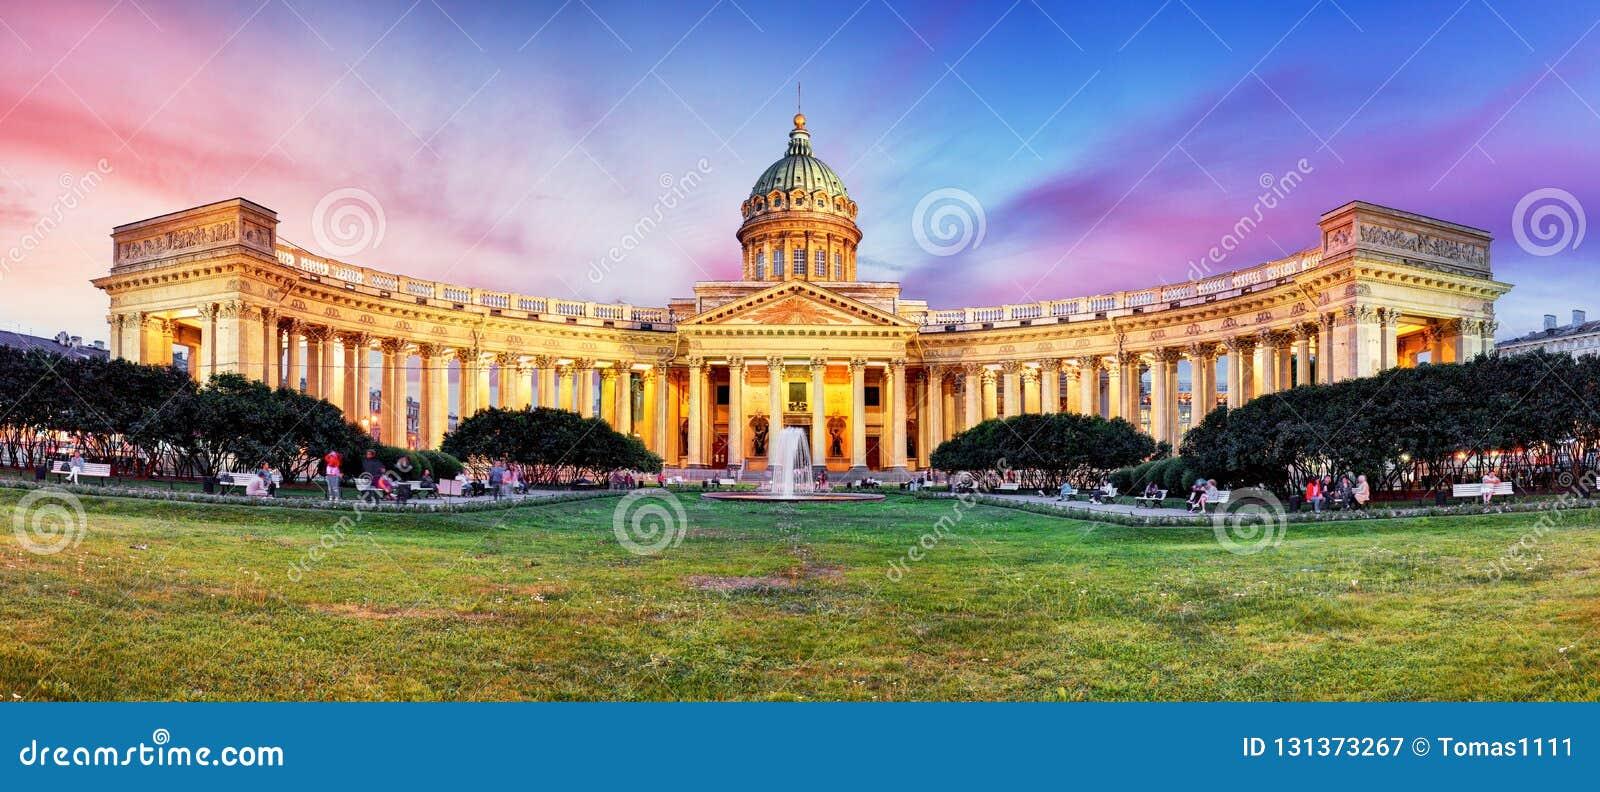 Собор на заходе солнца, никто России - Санкт-Петербурга, Казани